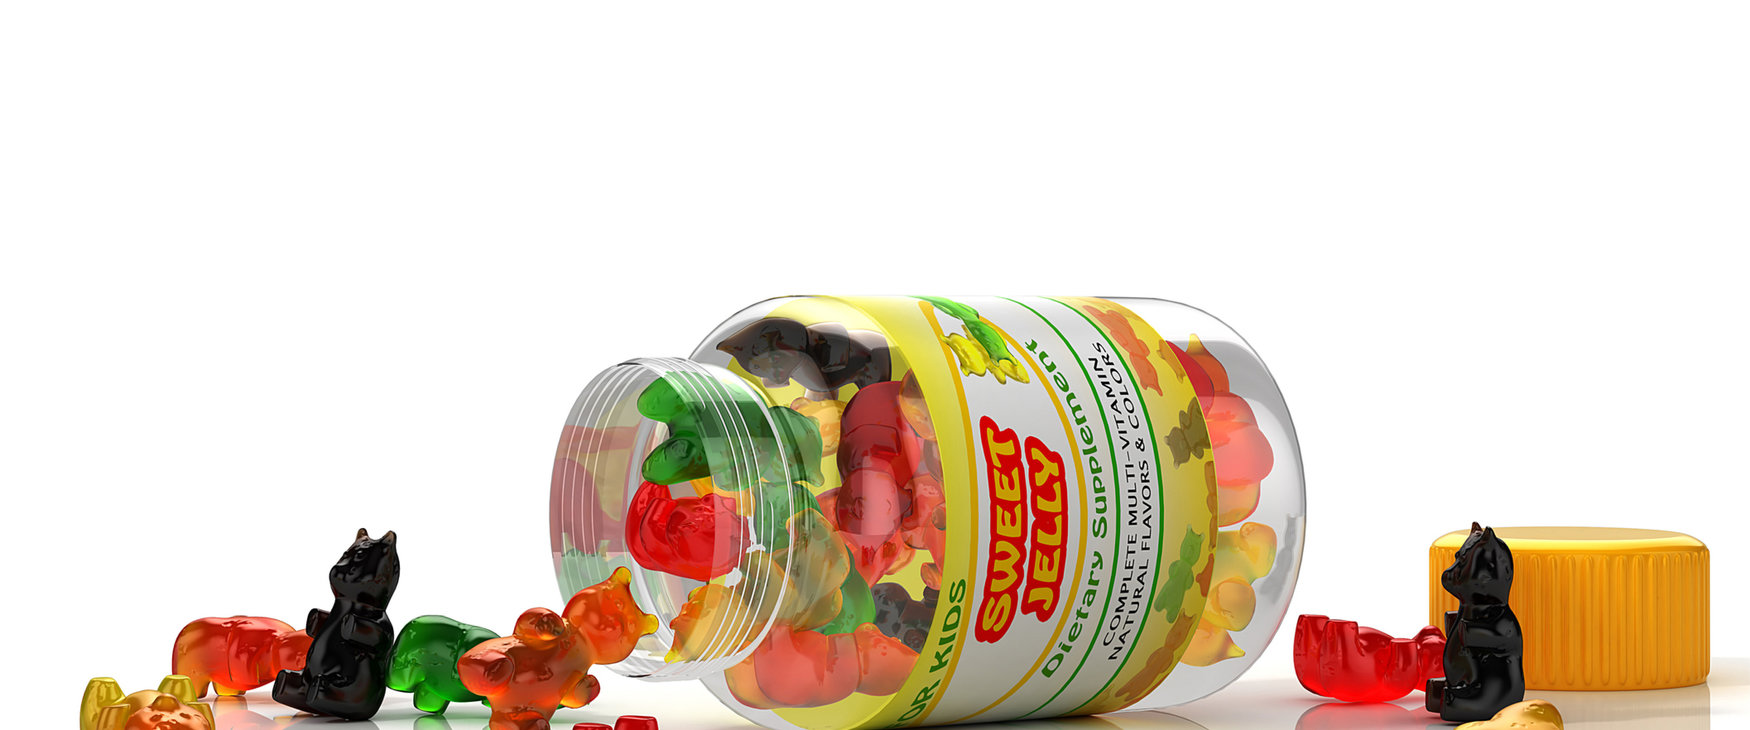 Vimanin gummies with Rousselot SiMoGel